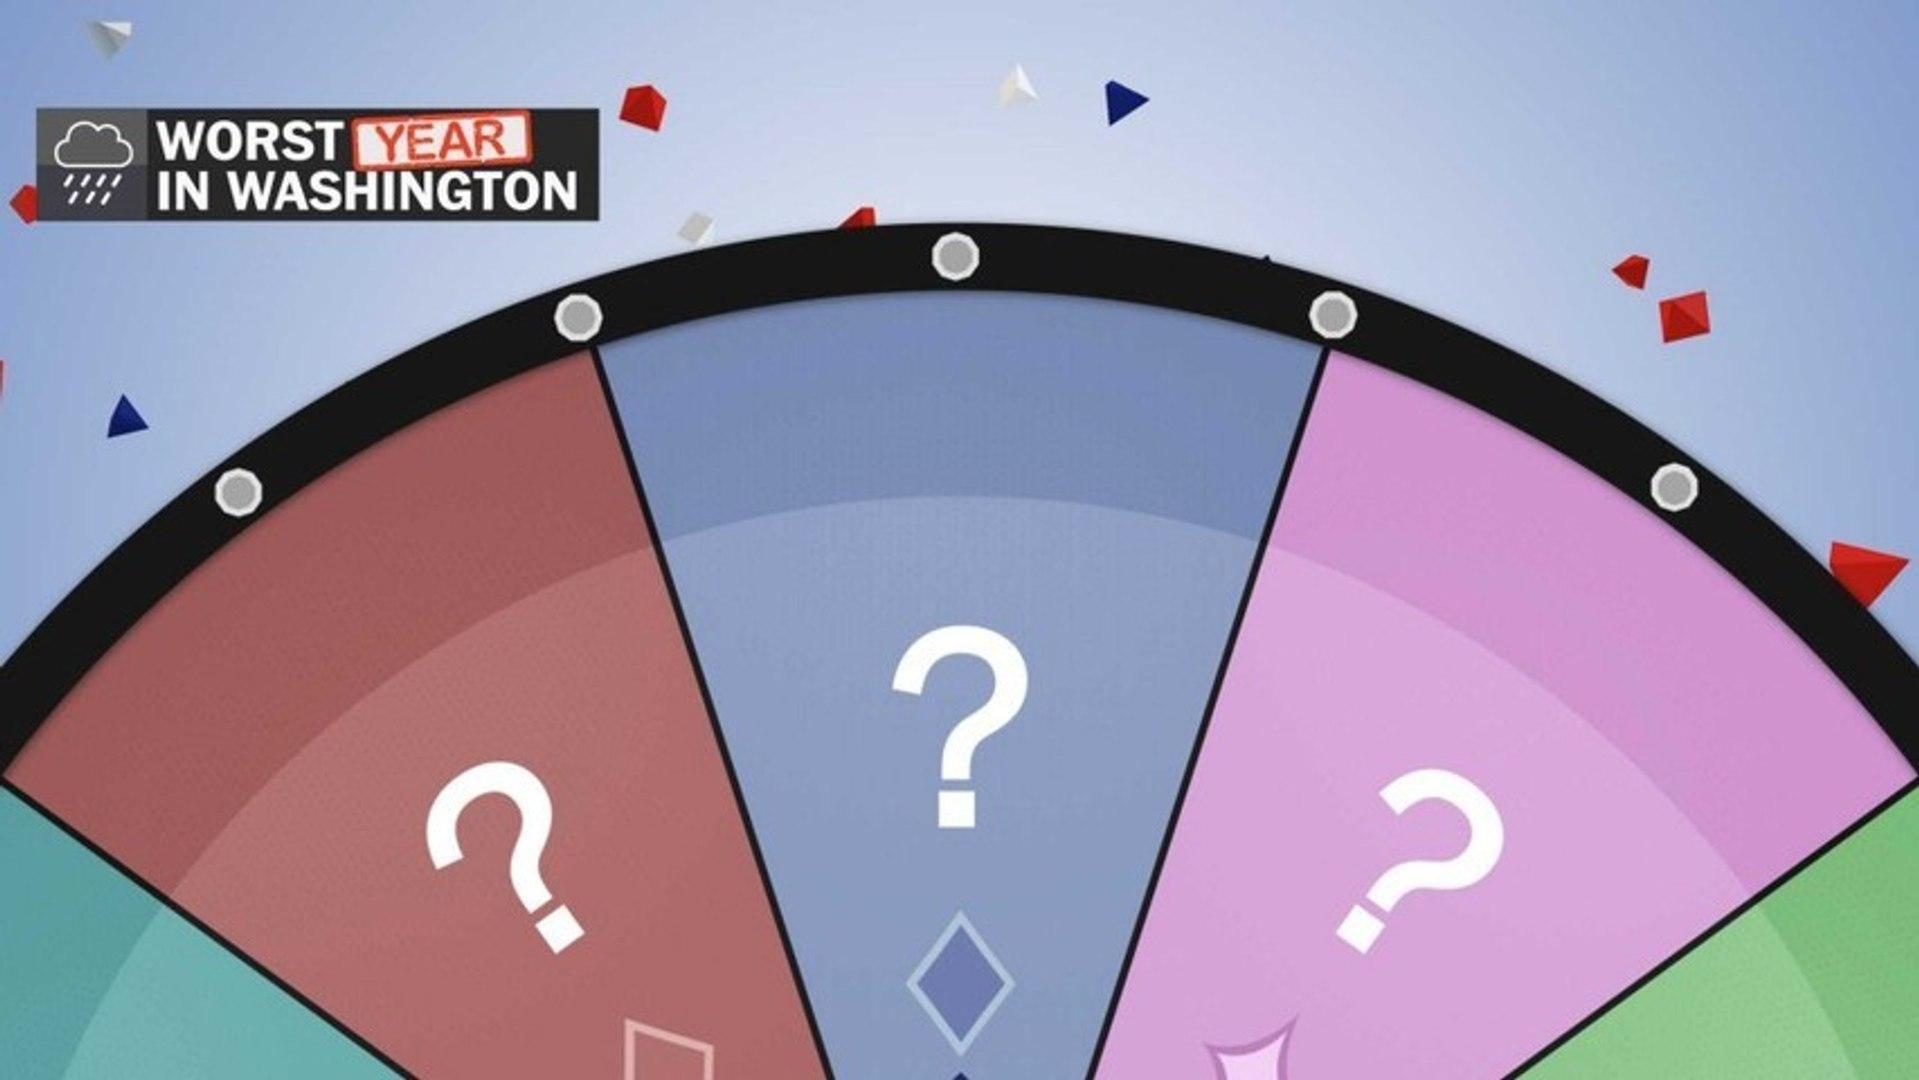 Who had the worst year in Washington?